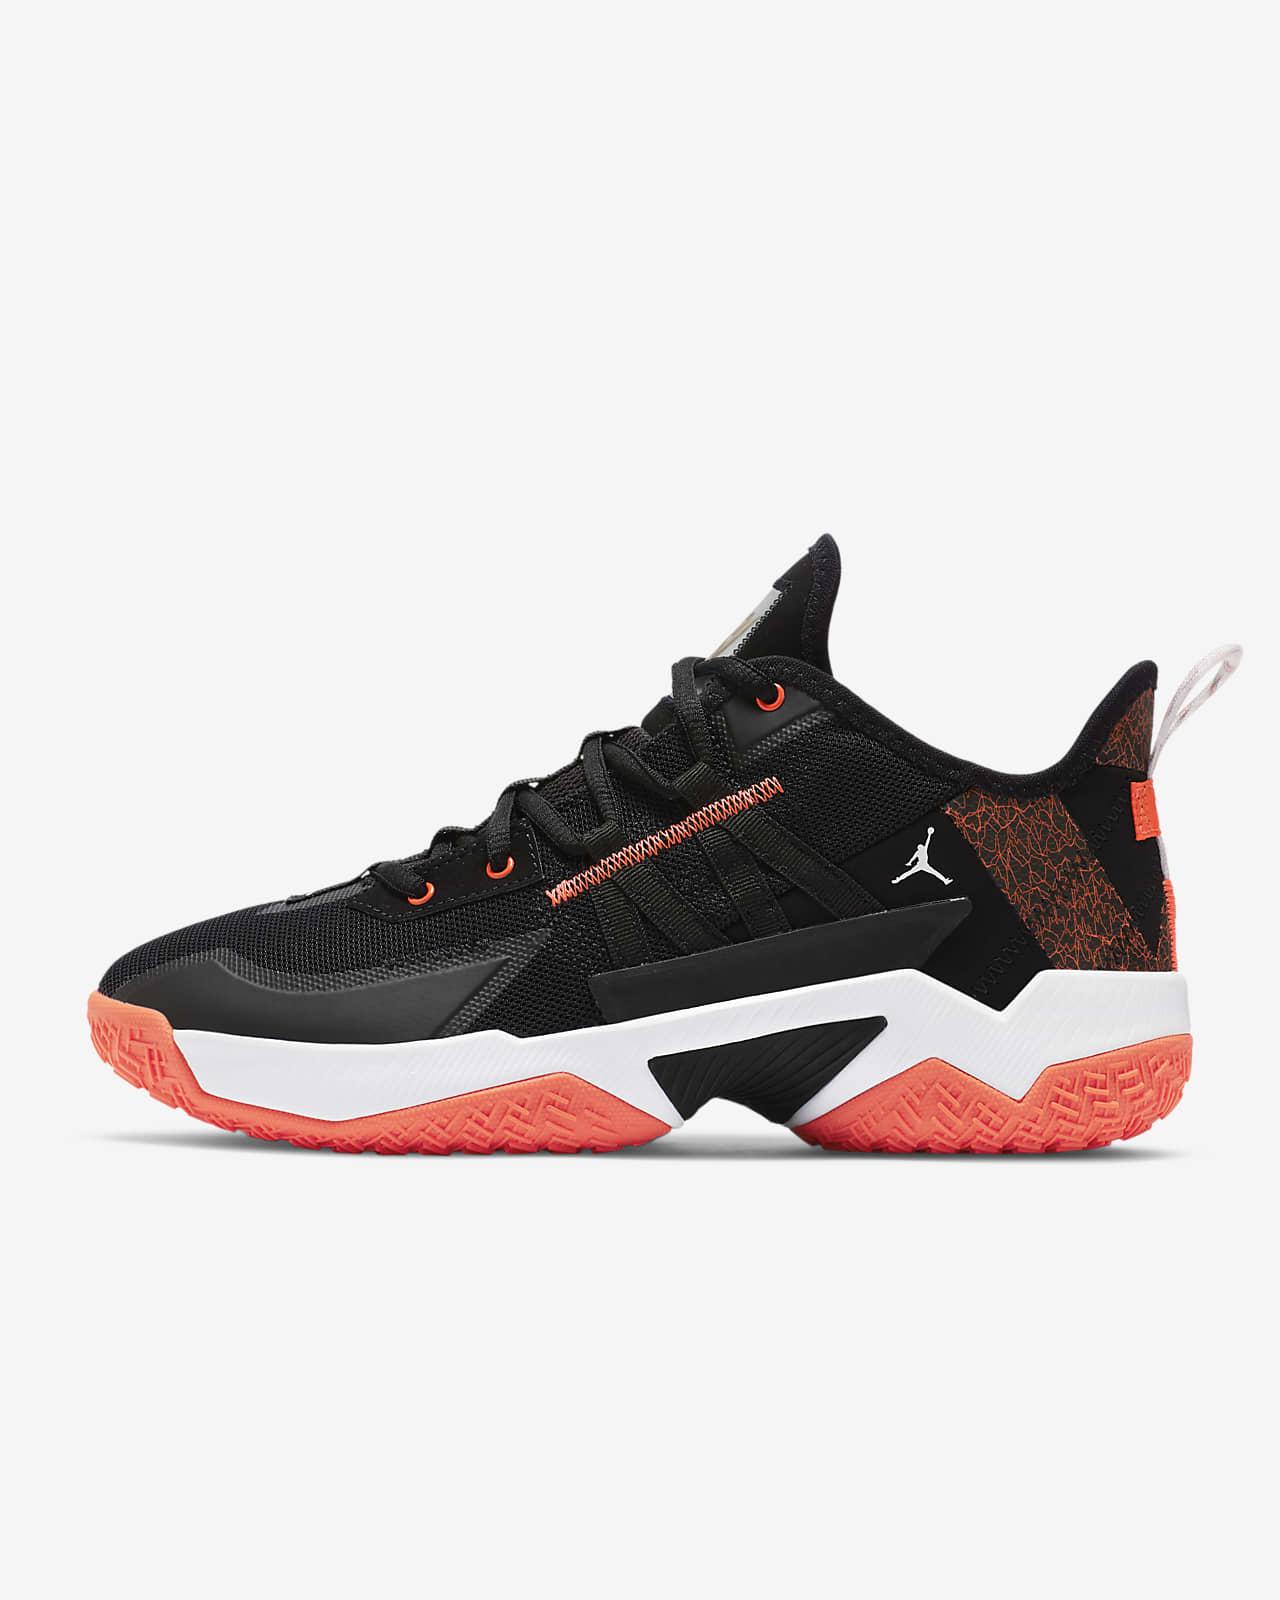 Jordan One Take II PF 男子篮球鞋